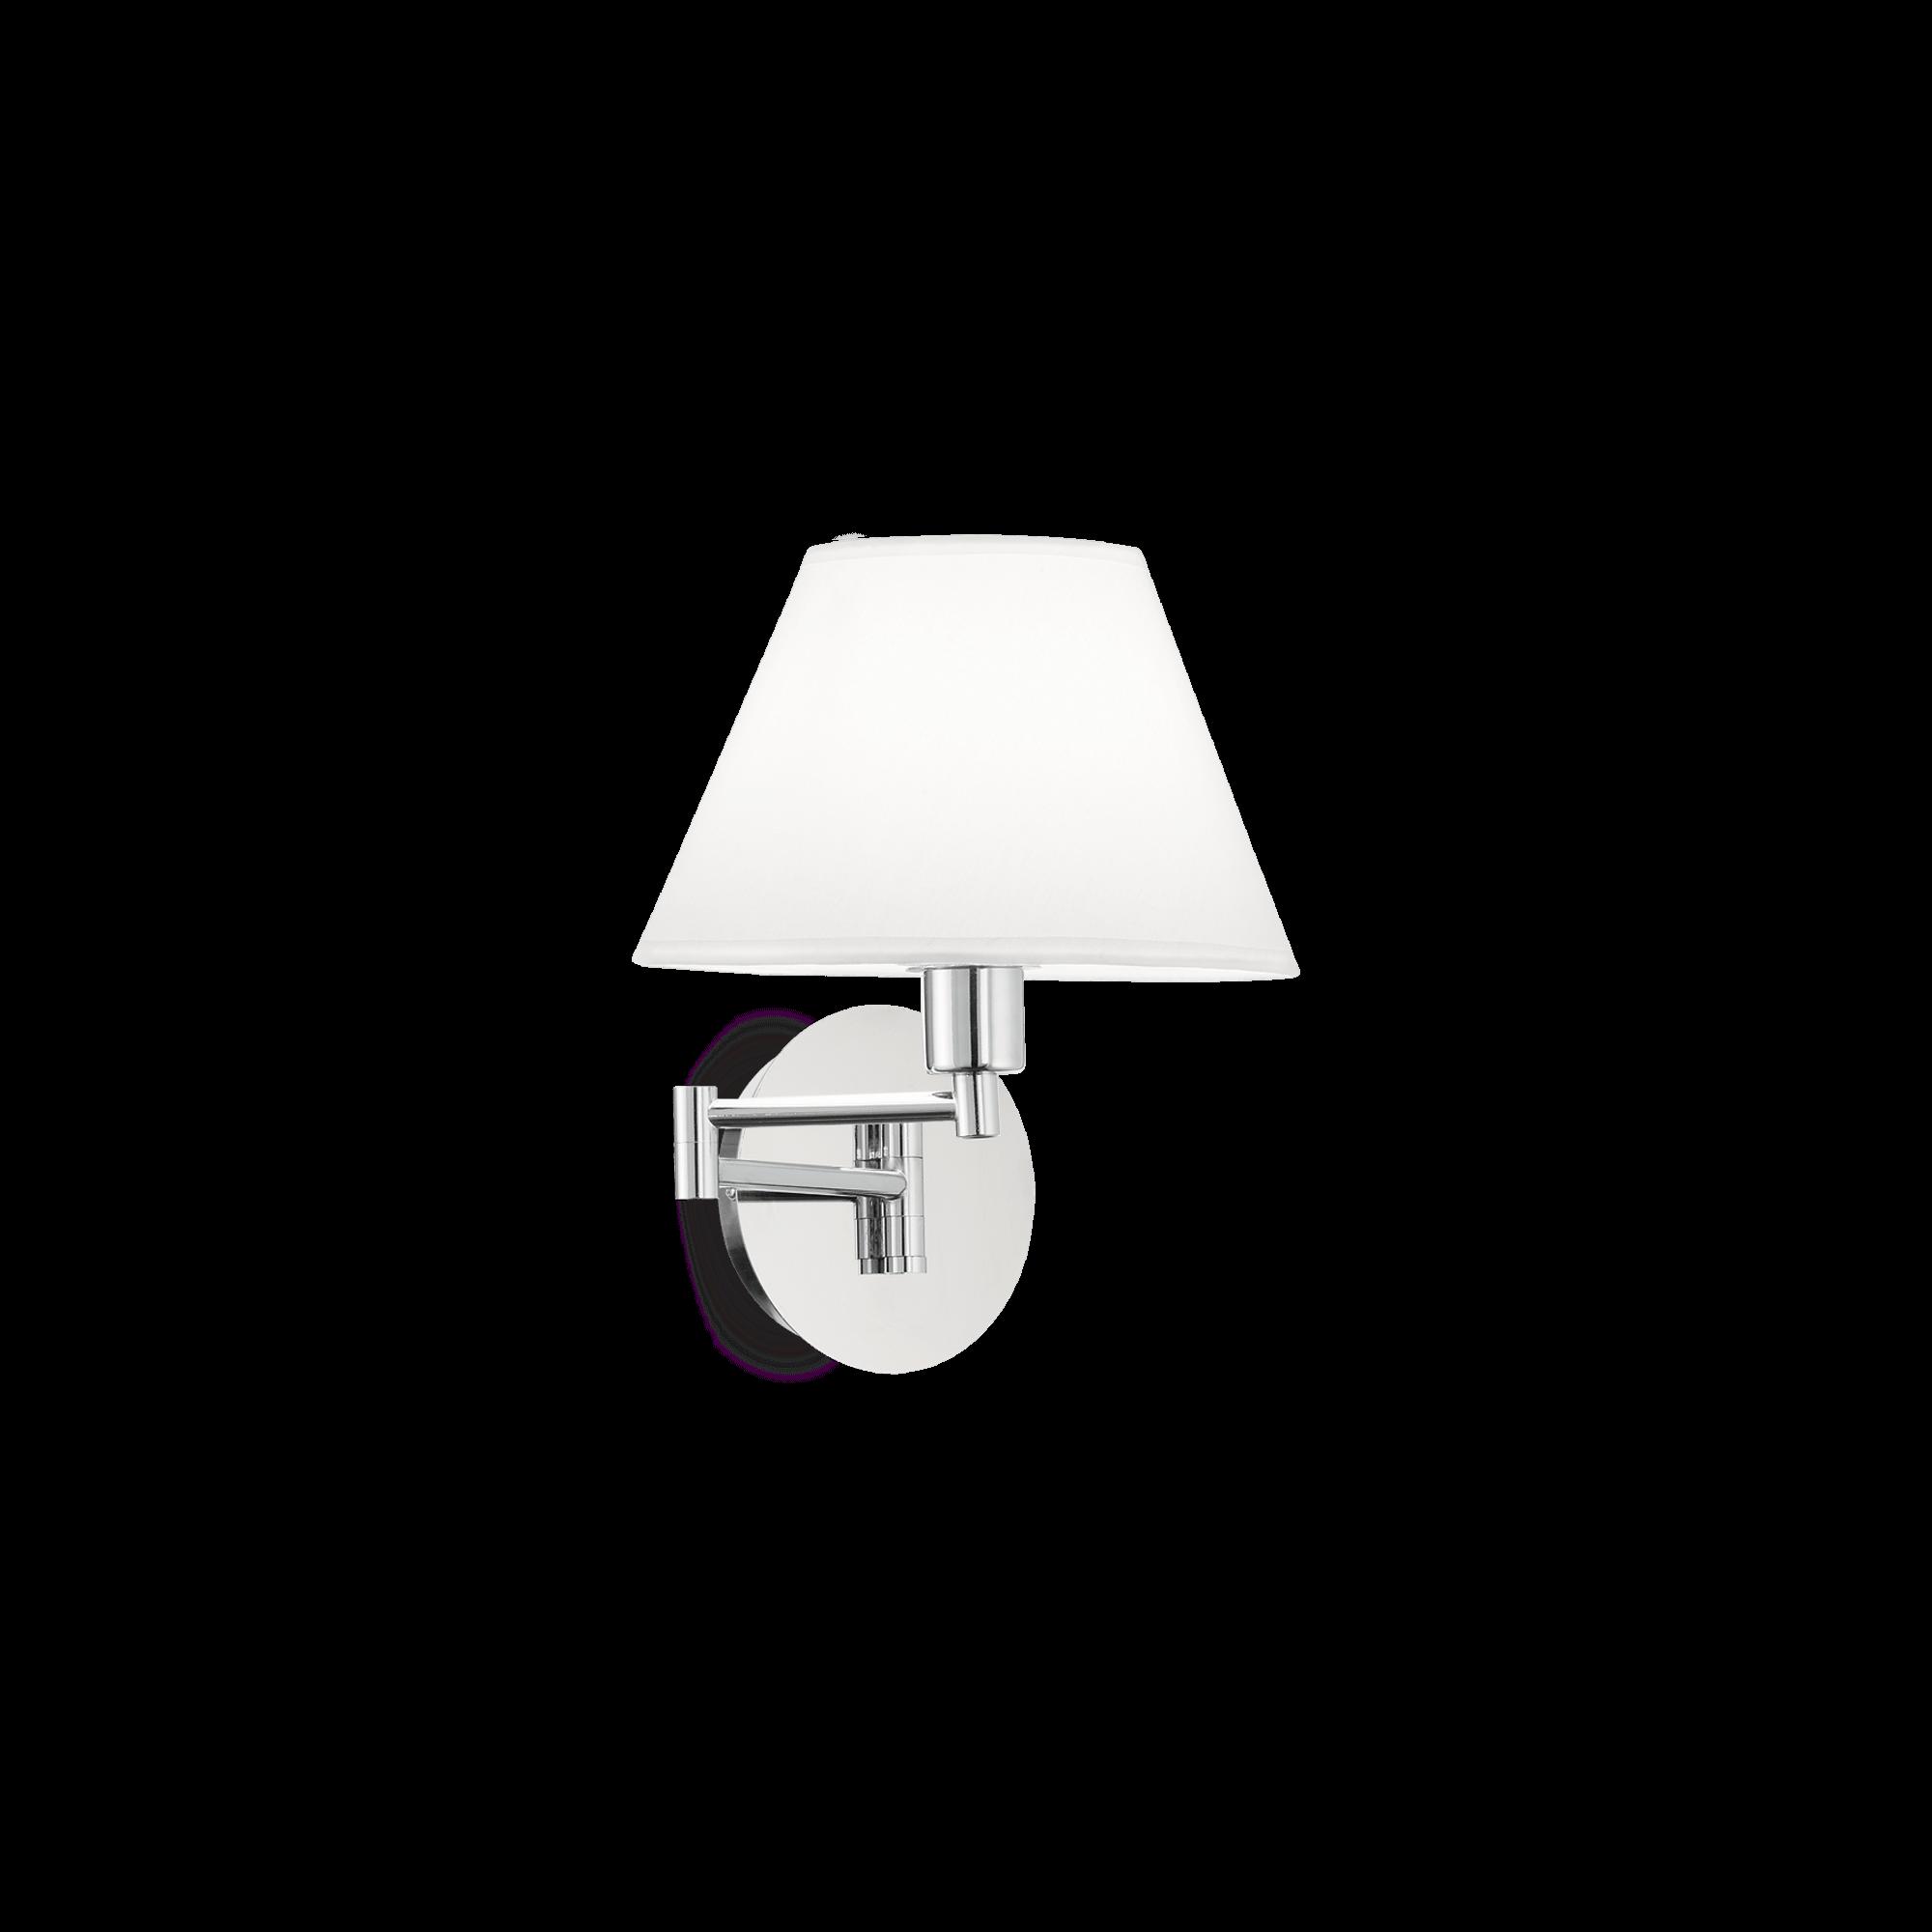 Ideal Lux 126784 BEVERLY AP1 CROMO falikar